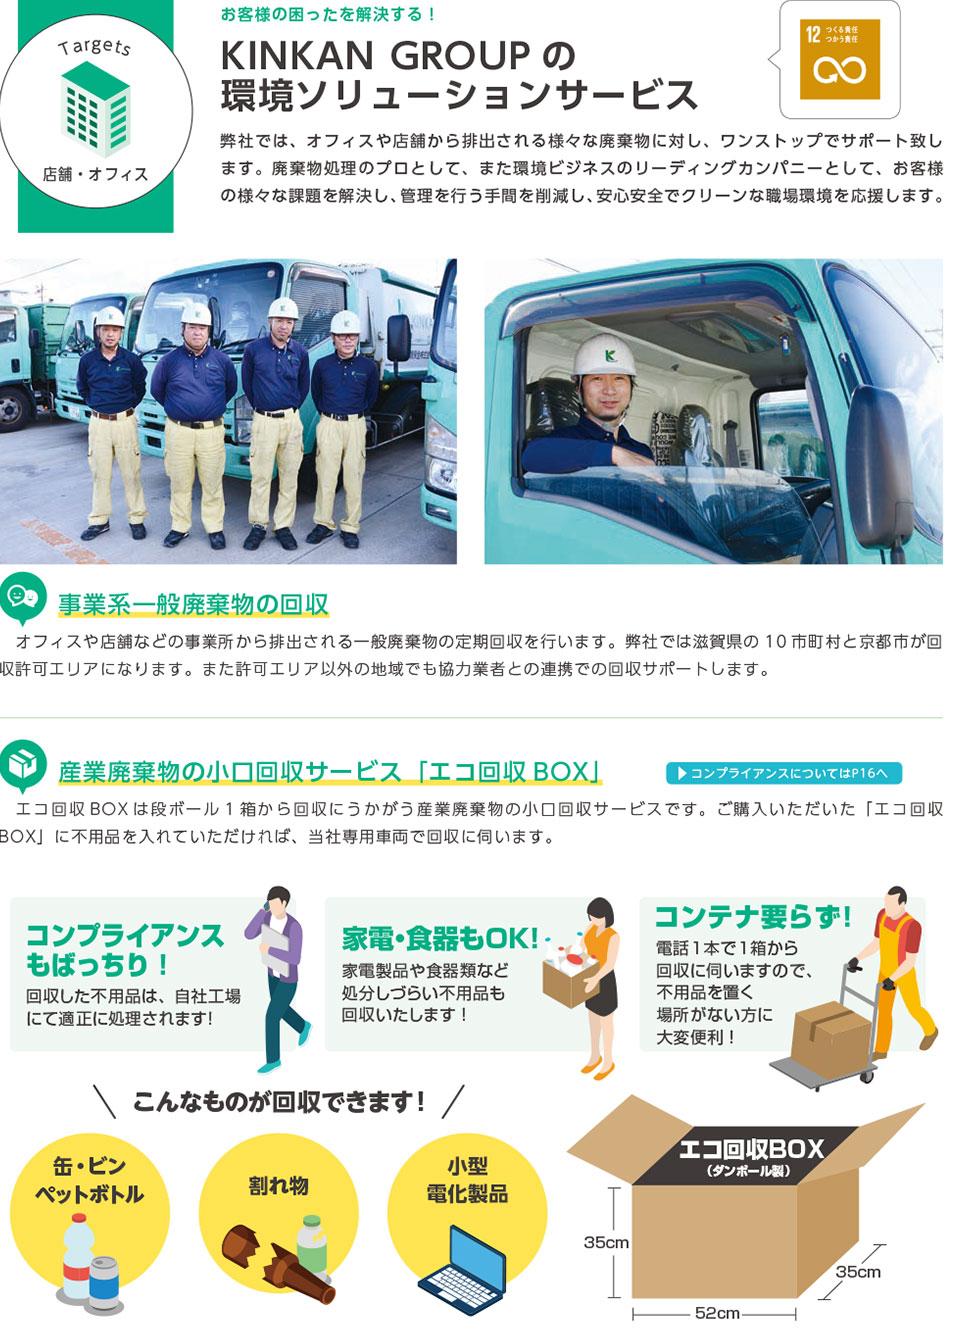 KINKAN GROUP の環境ソリューションサービス